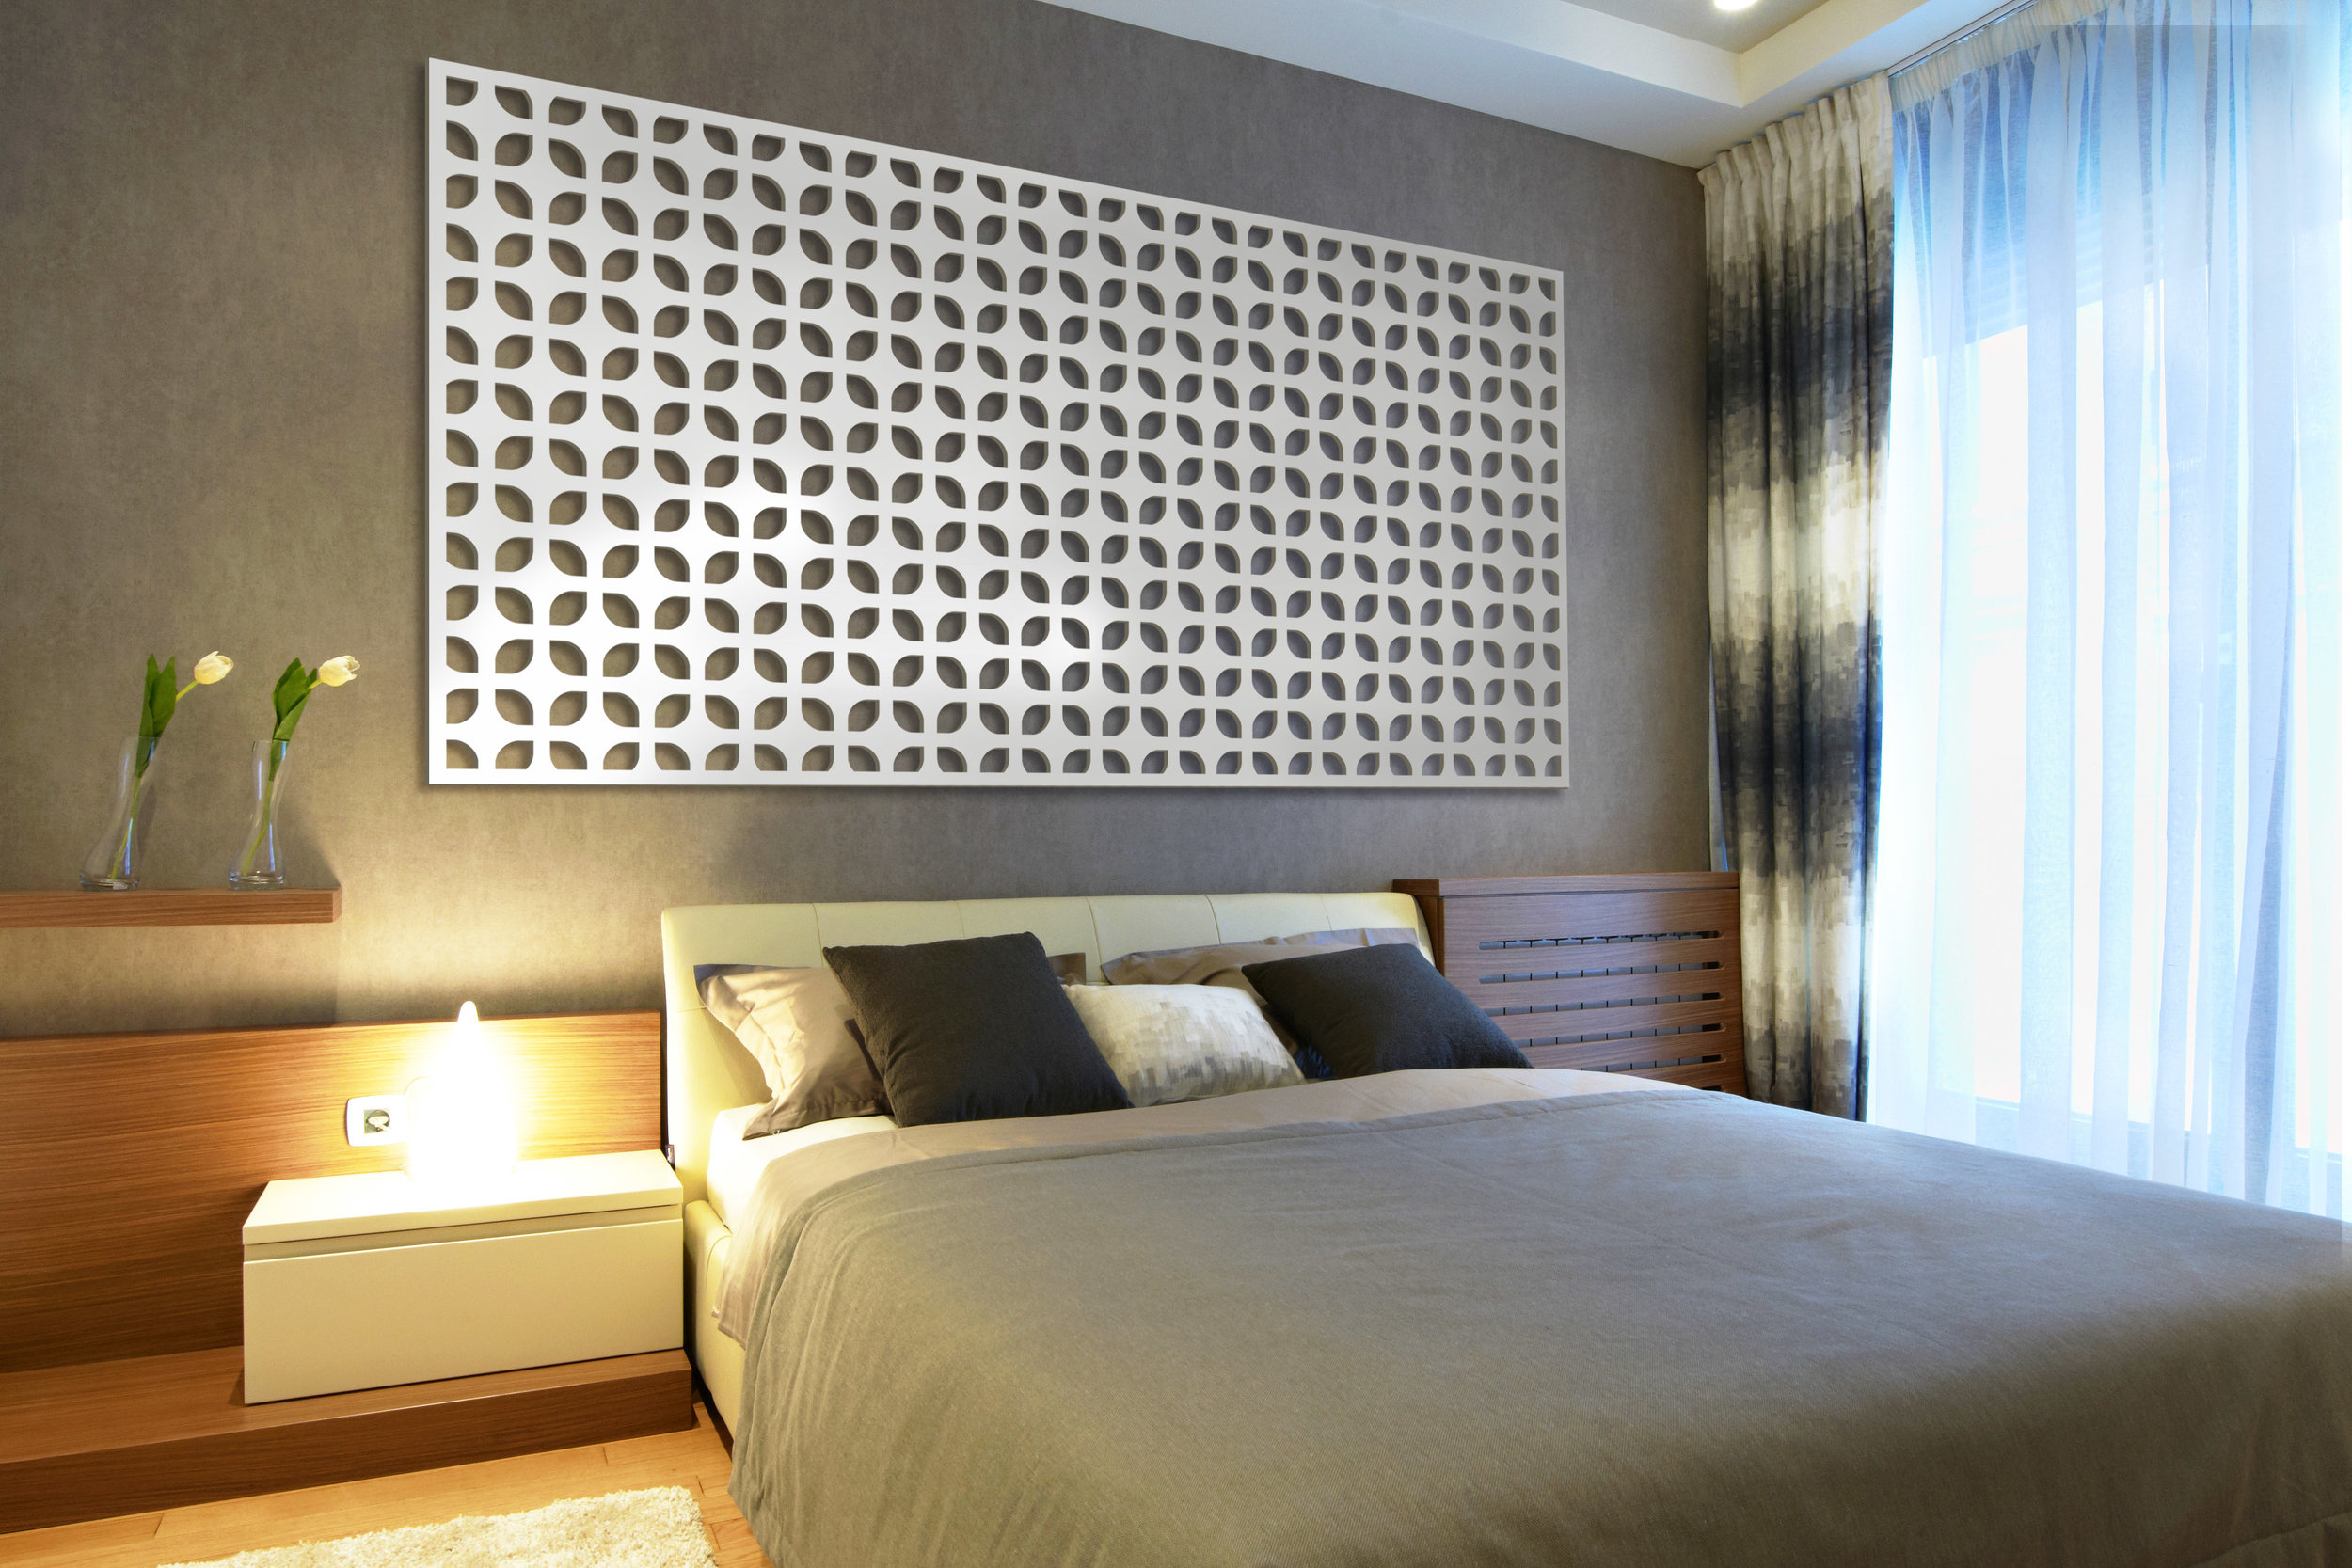 Installation Rendering C   Copengagan decorative hotel wall panel - painted